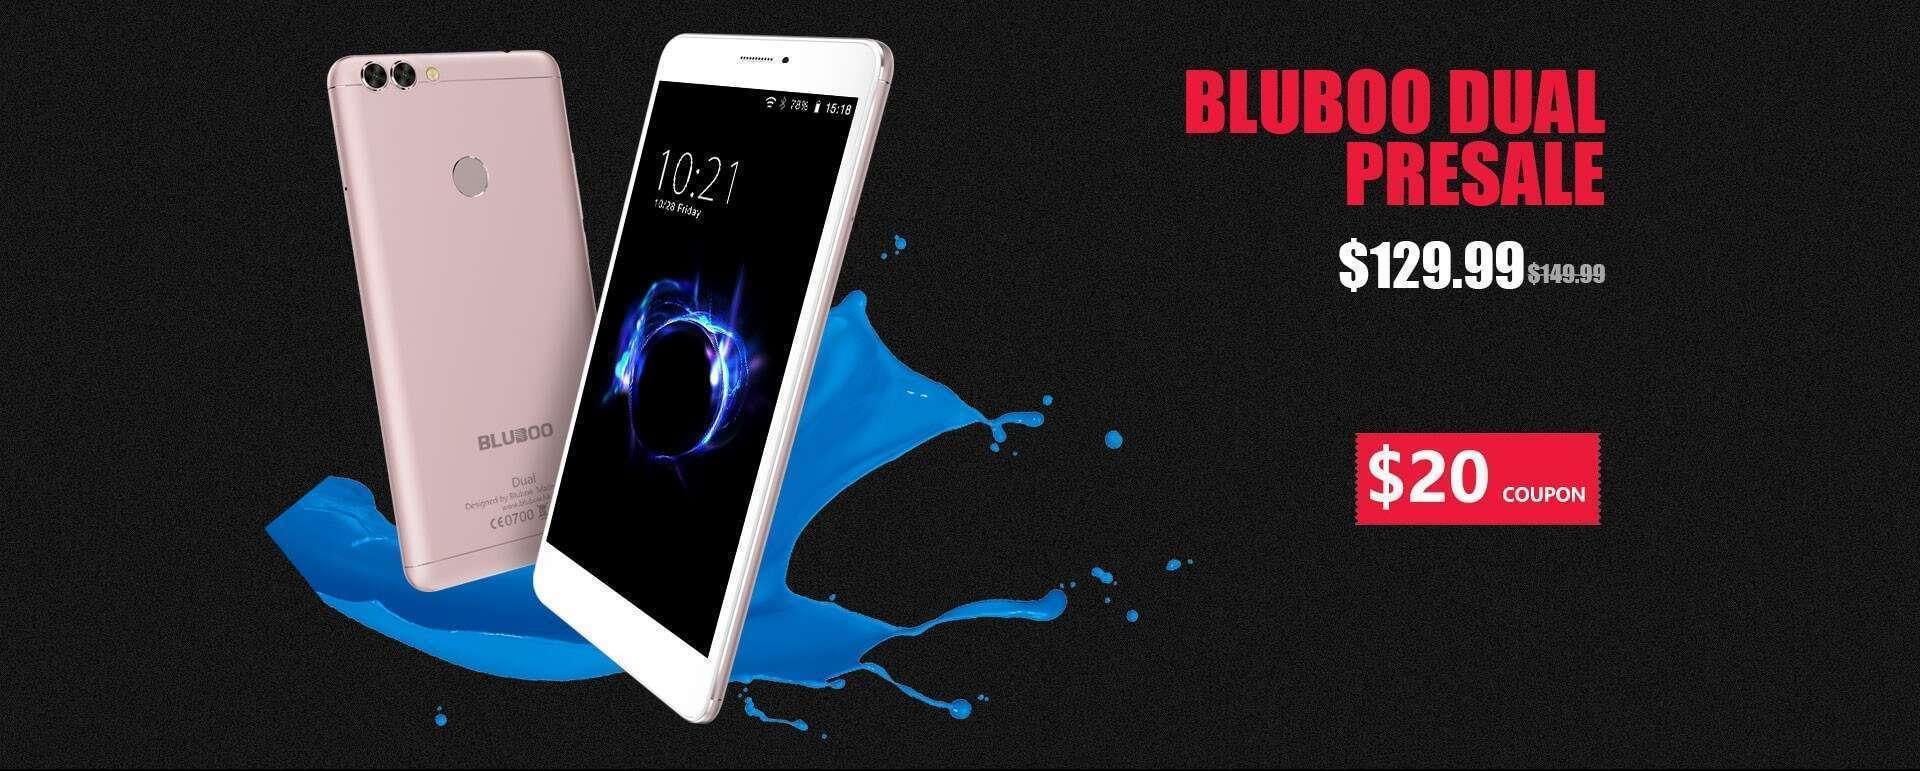 Bluboo Dual Global Presales